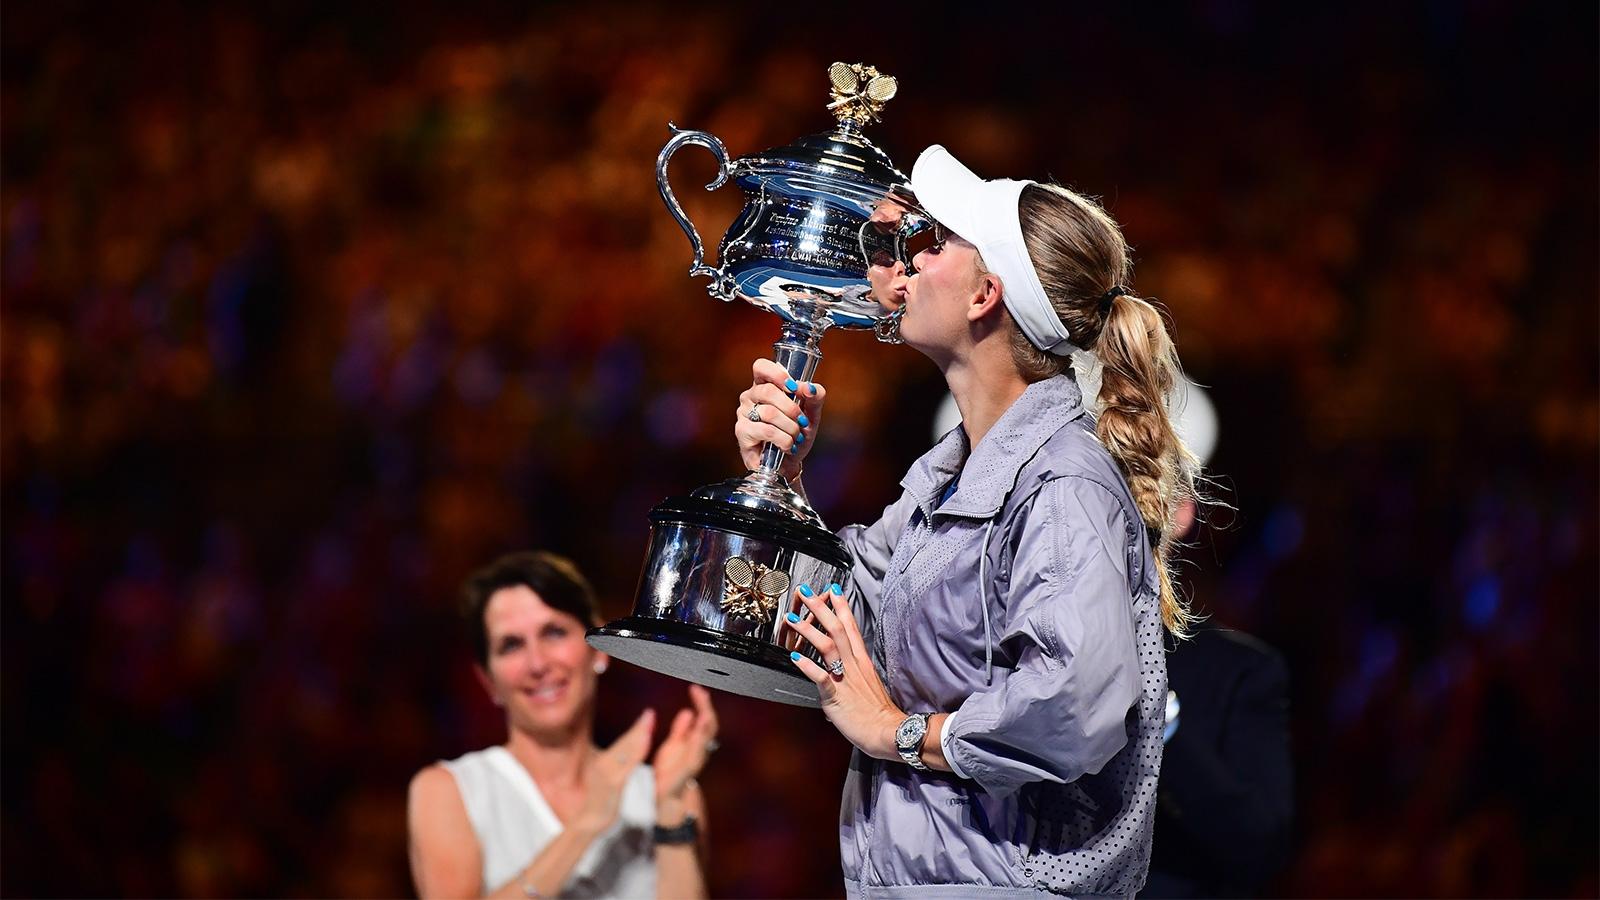 Australian Open 2018 - final Ca - tennisblog   ello